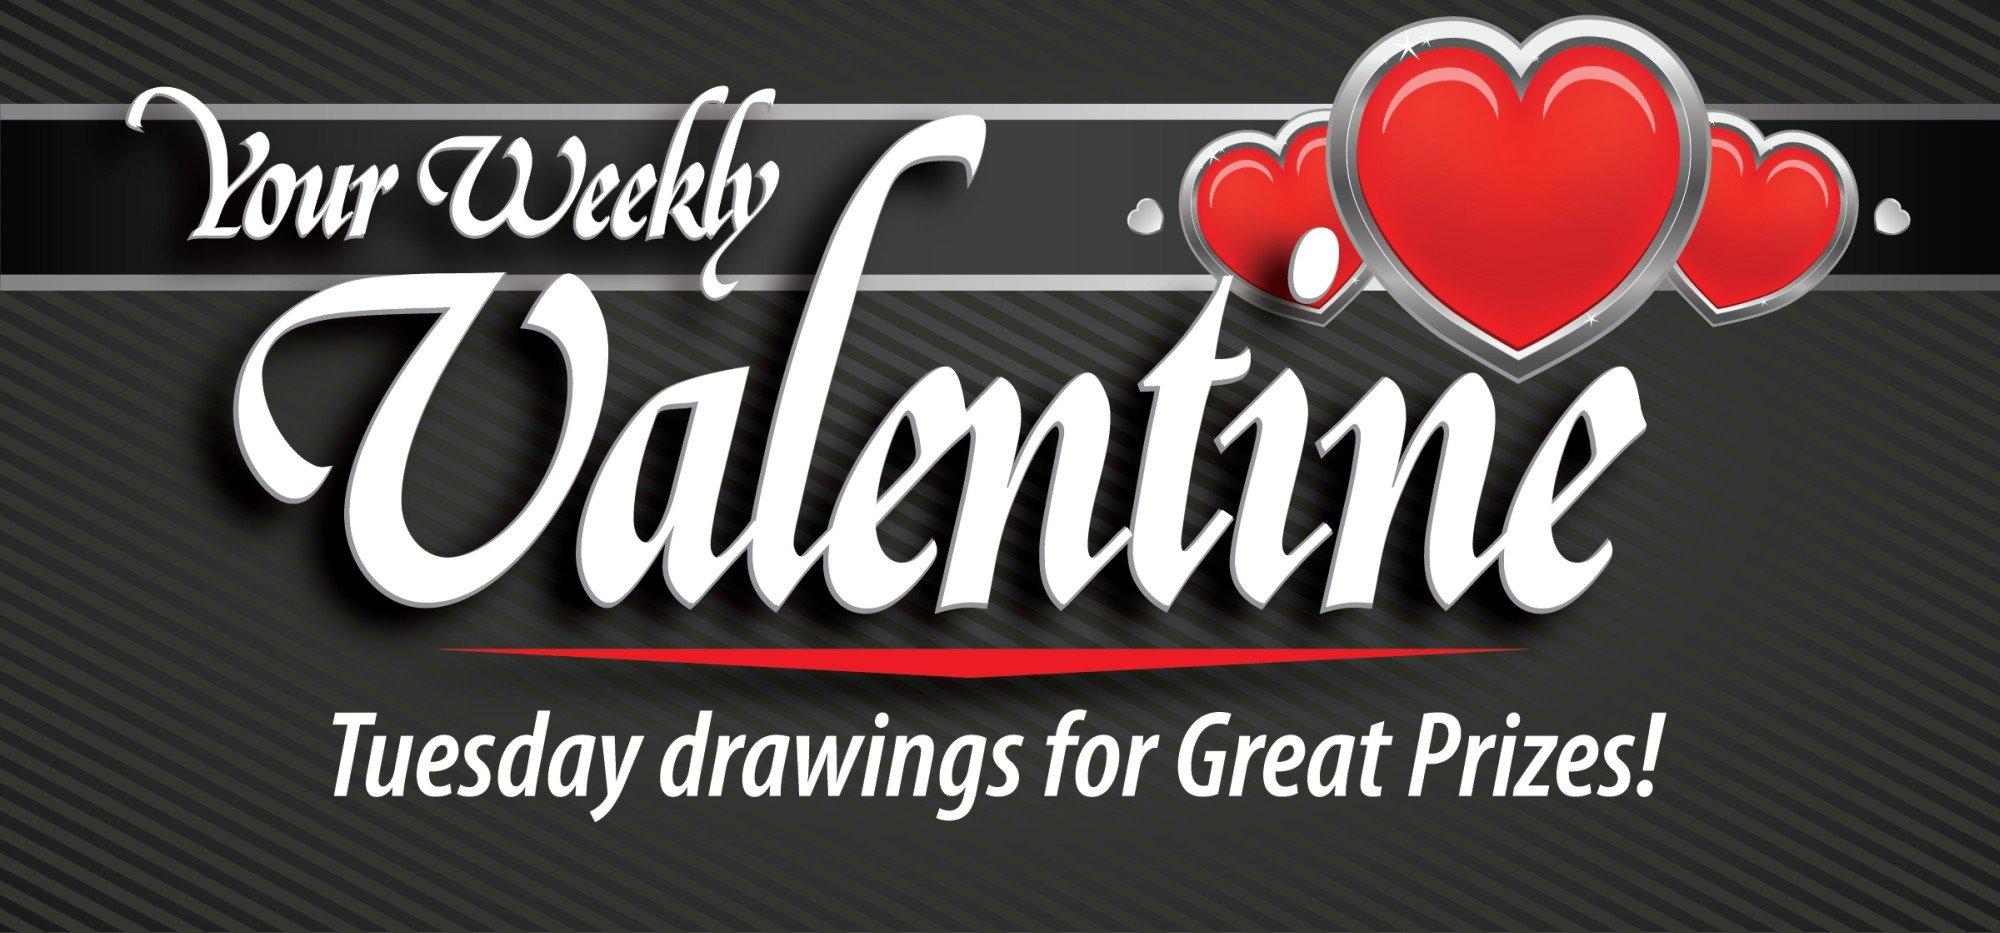 Web Header Promotion-February Weekly Valentine